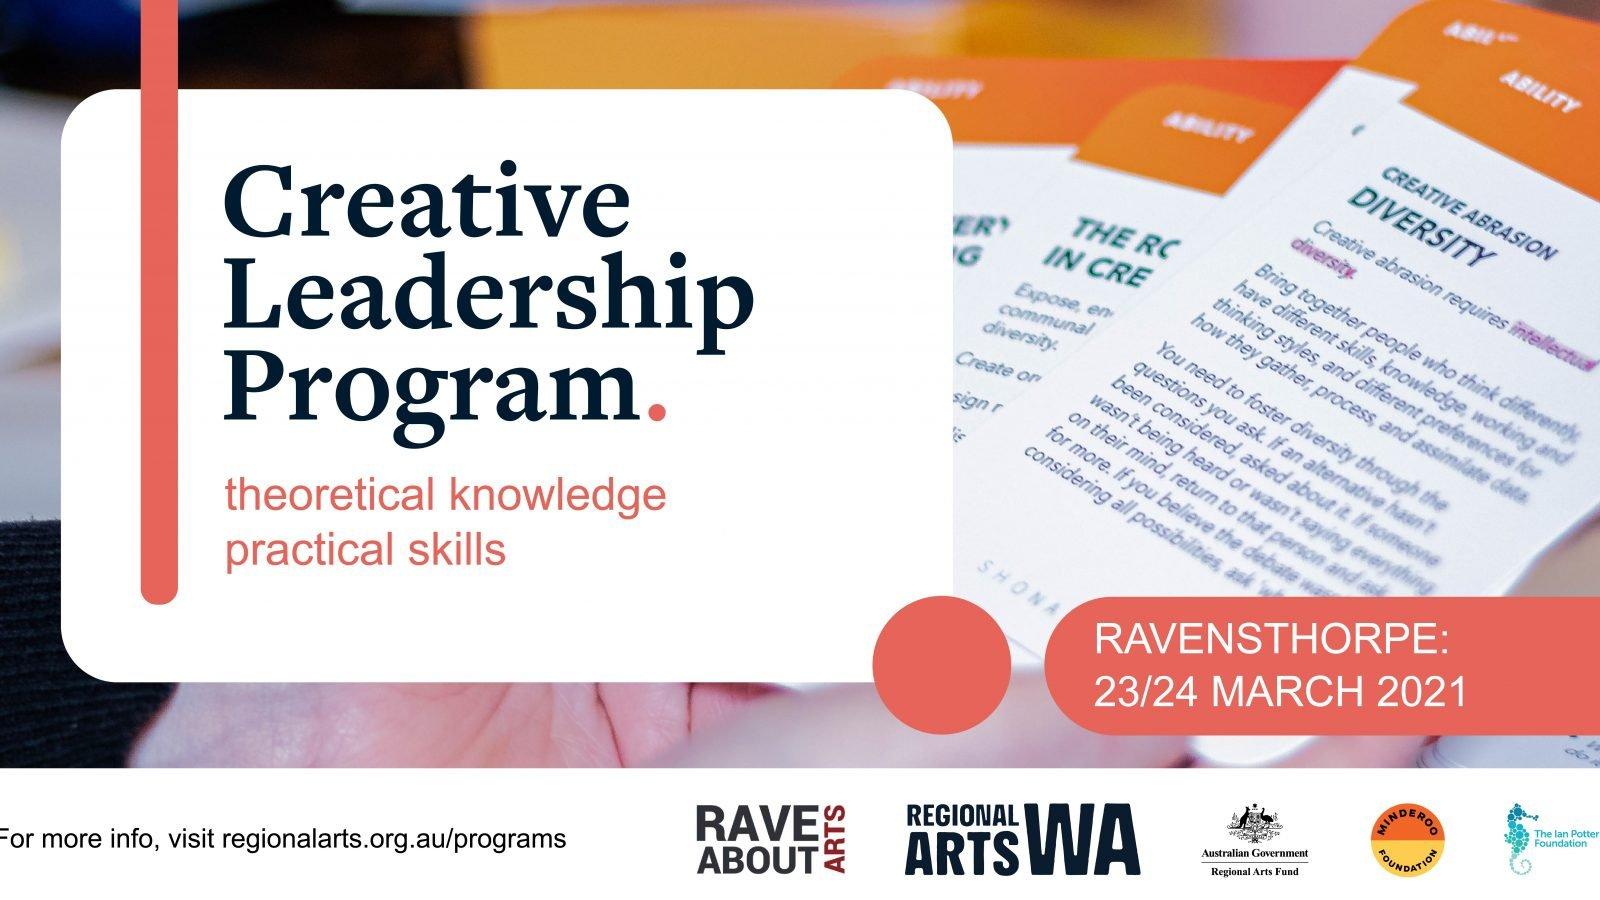 Creative Leadership program